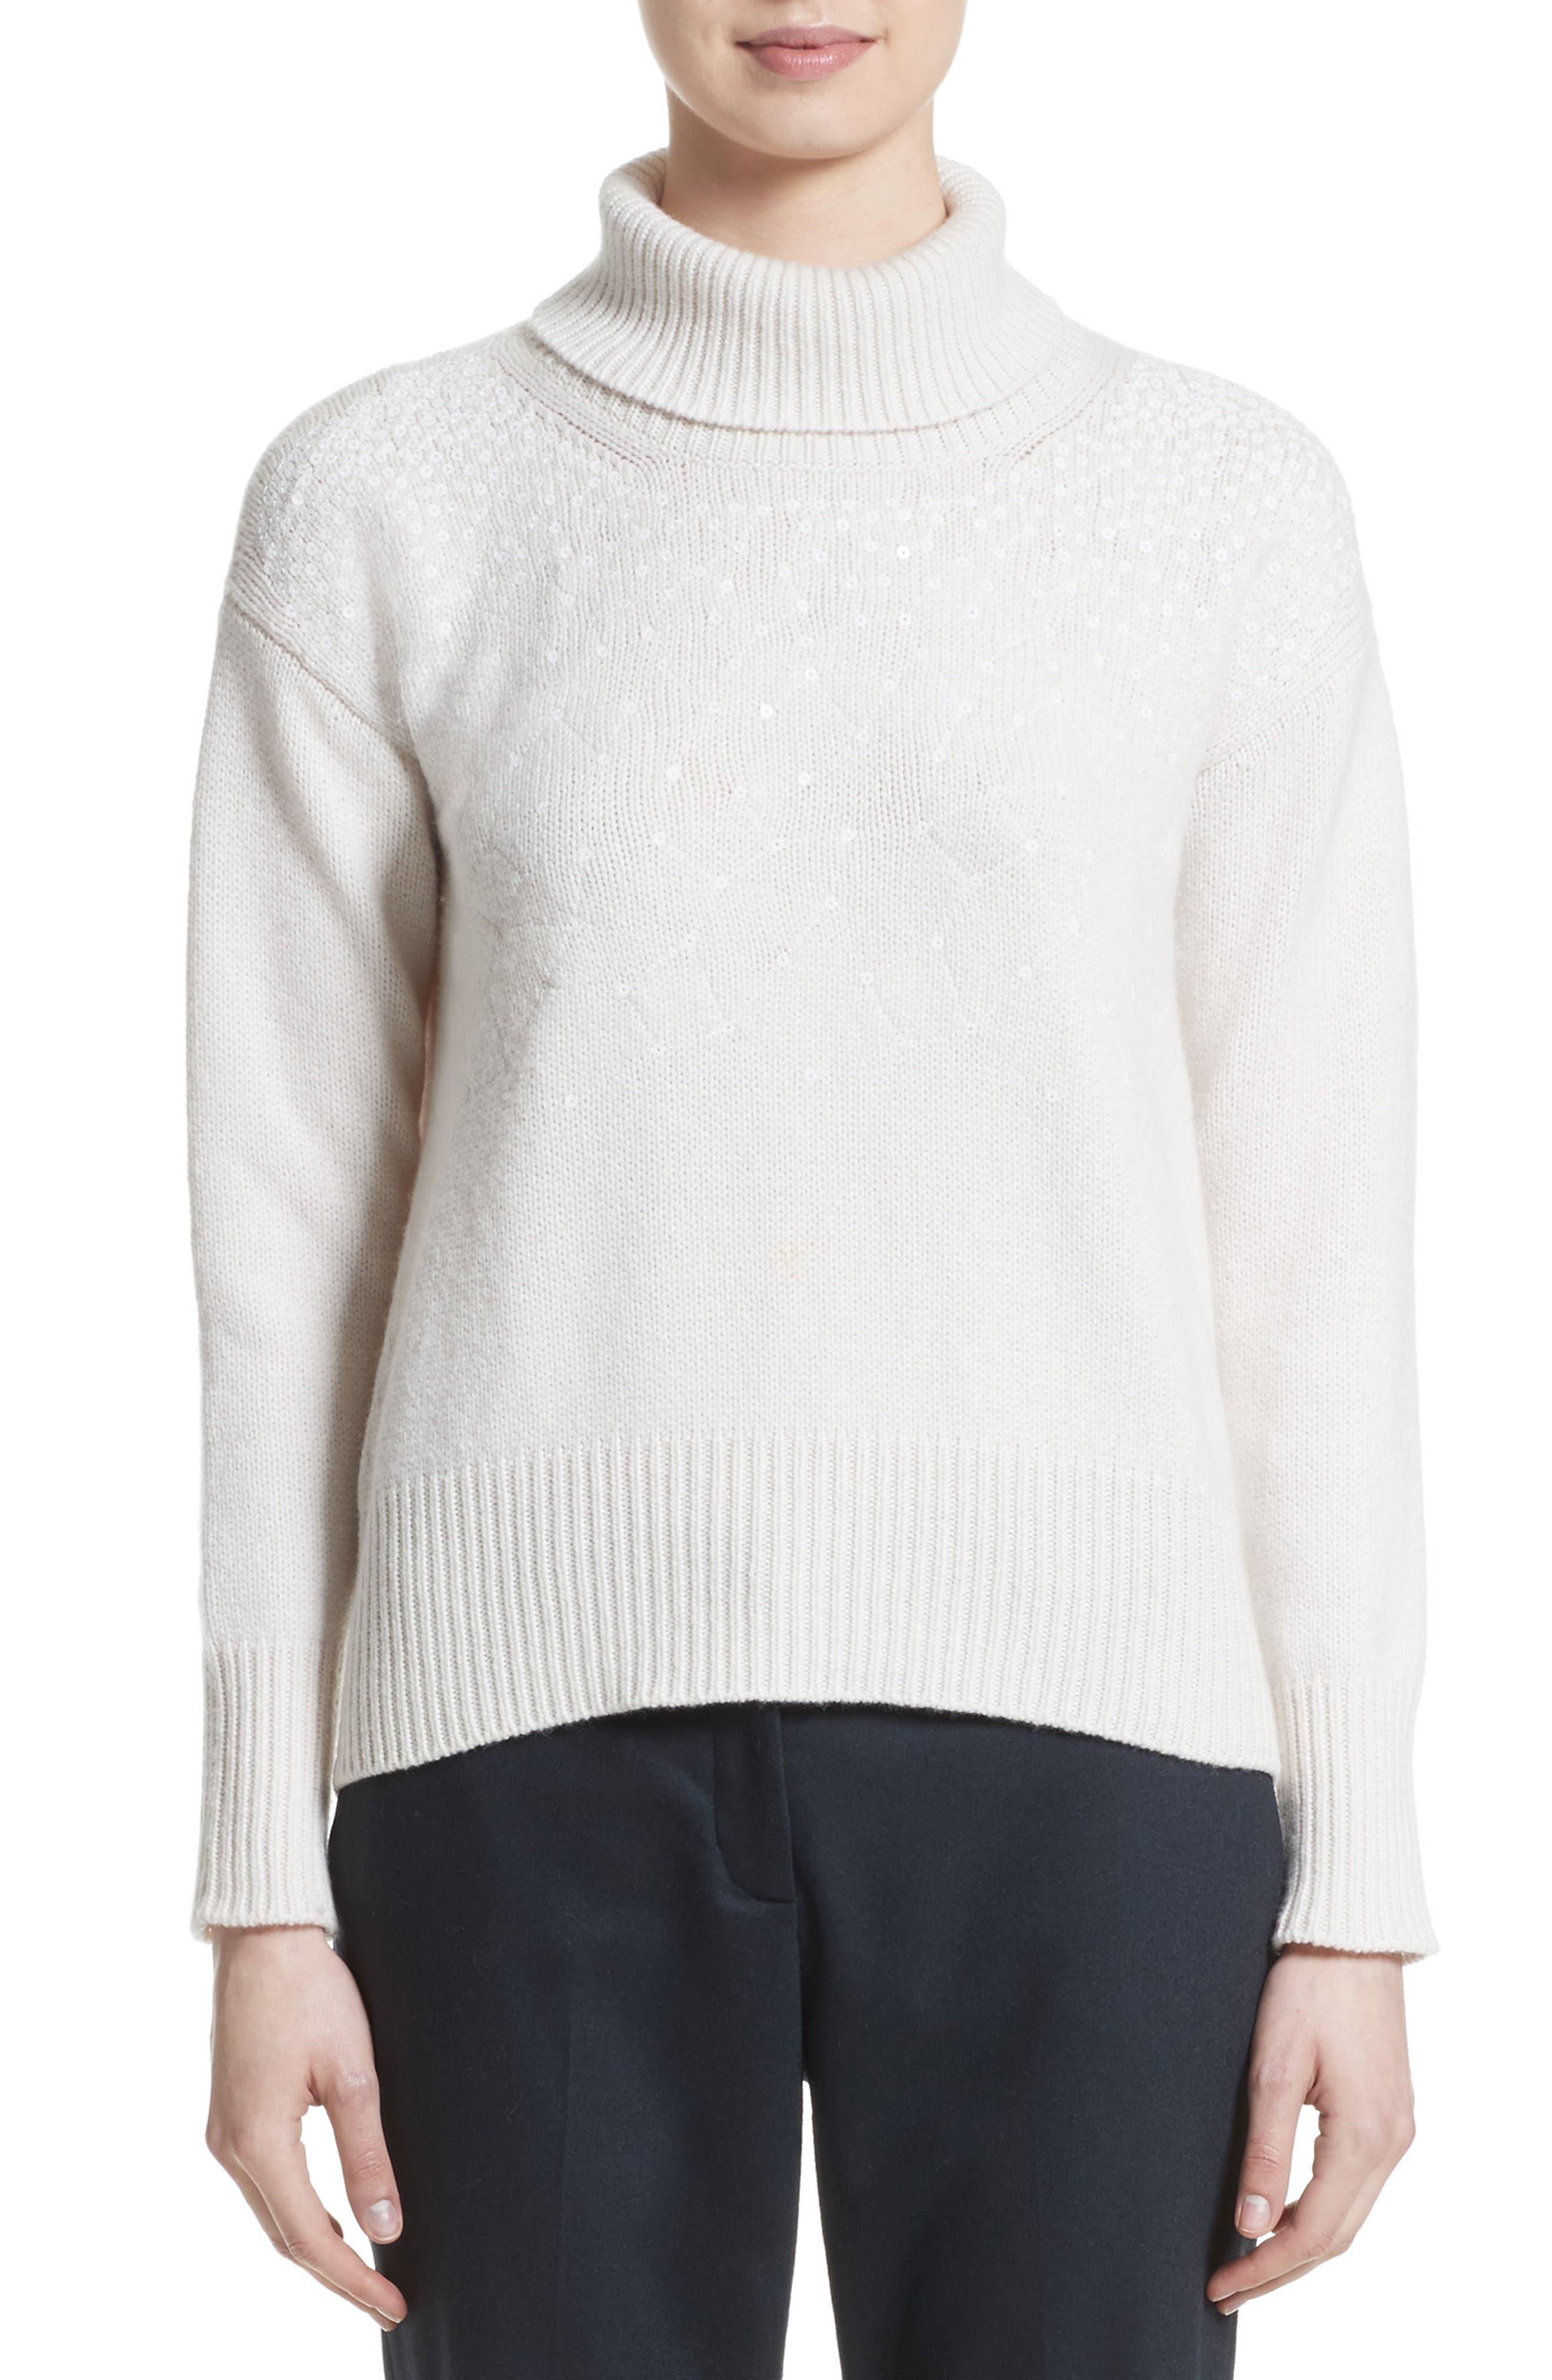 Fabiana Filippi Sequin Embellished Wool Turtleneck Sweater (Nordstrom Exclusive)